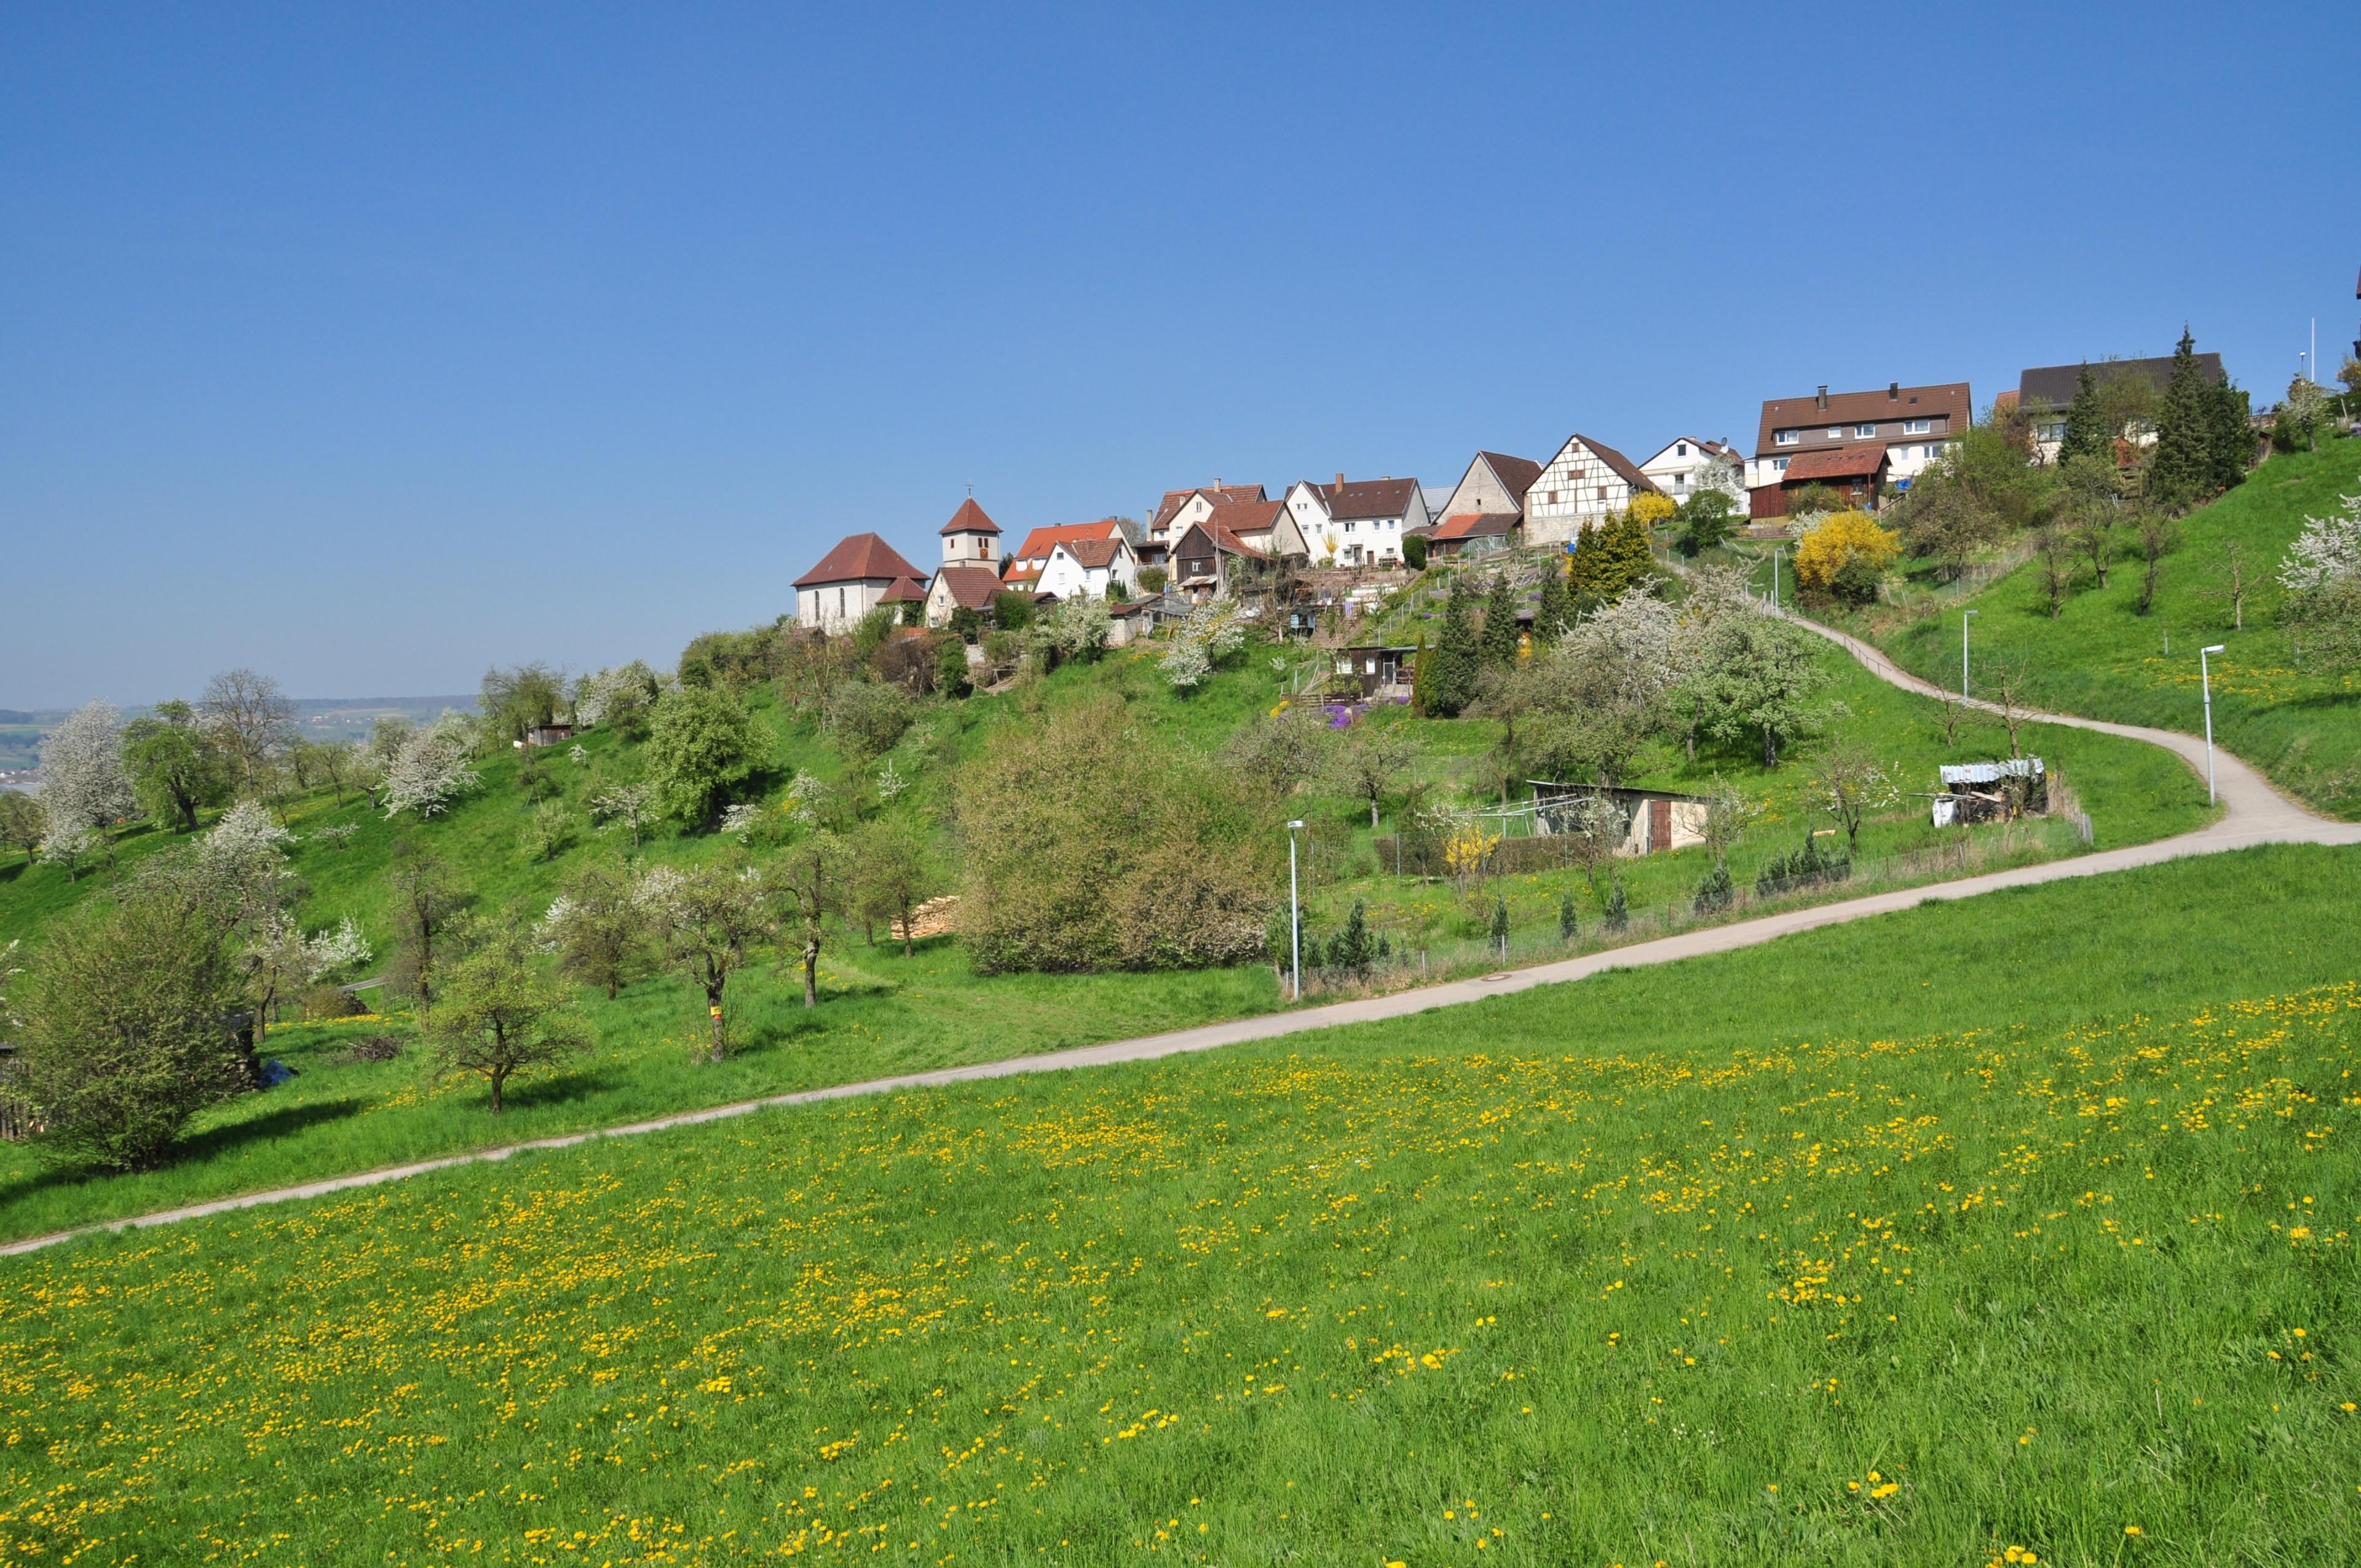 Böblingen District, Baden-Württemberg, Germany